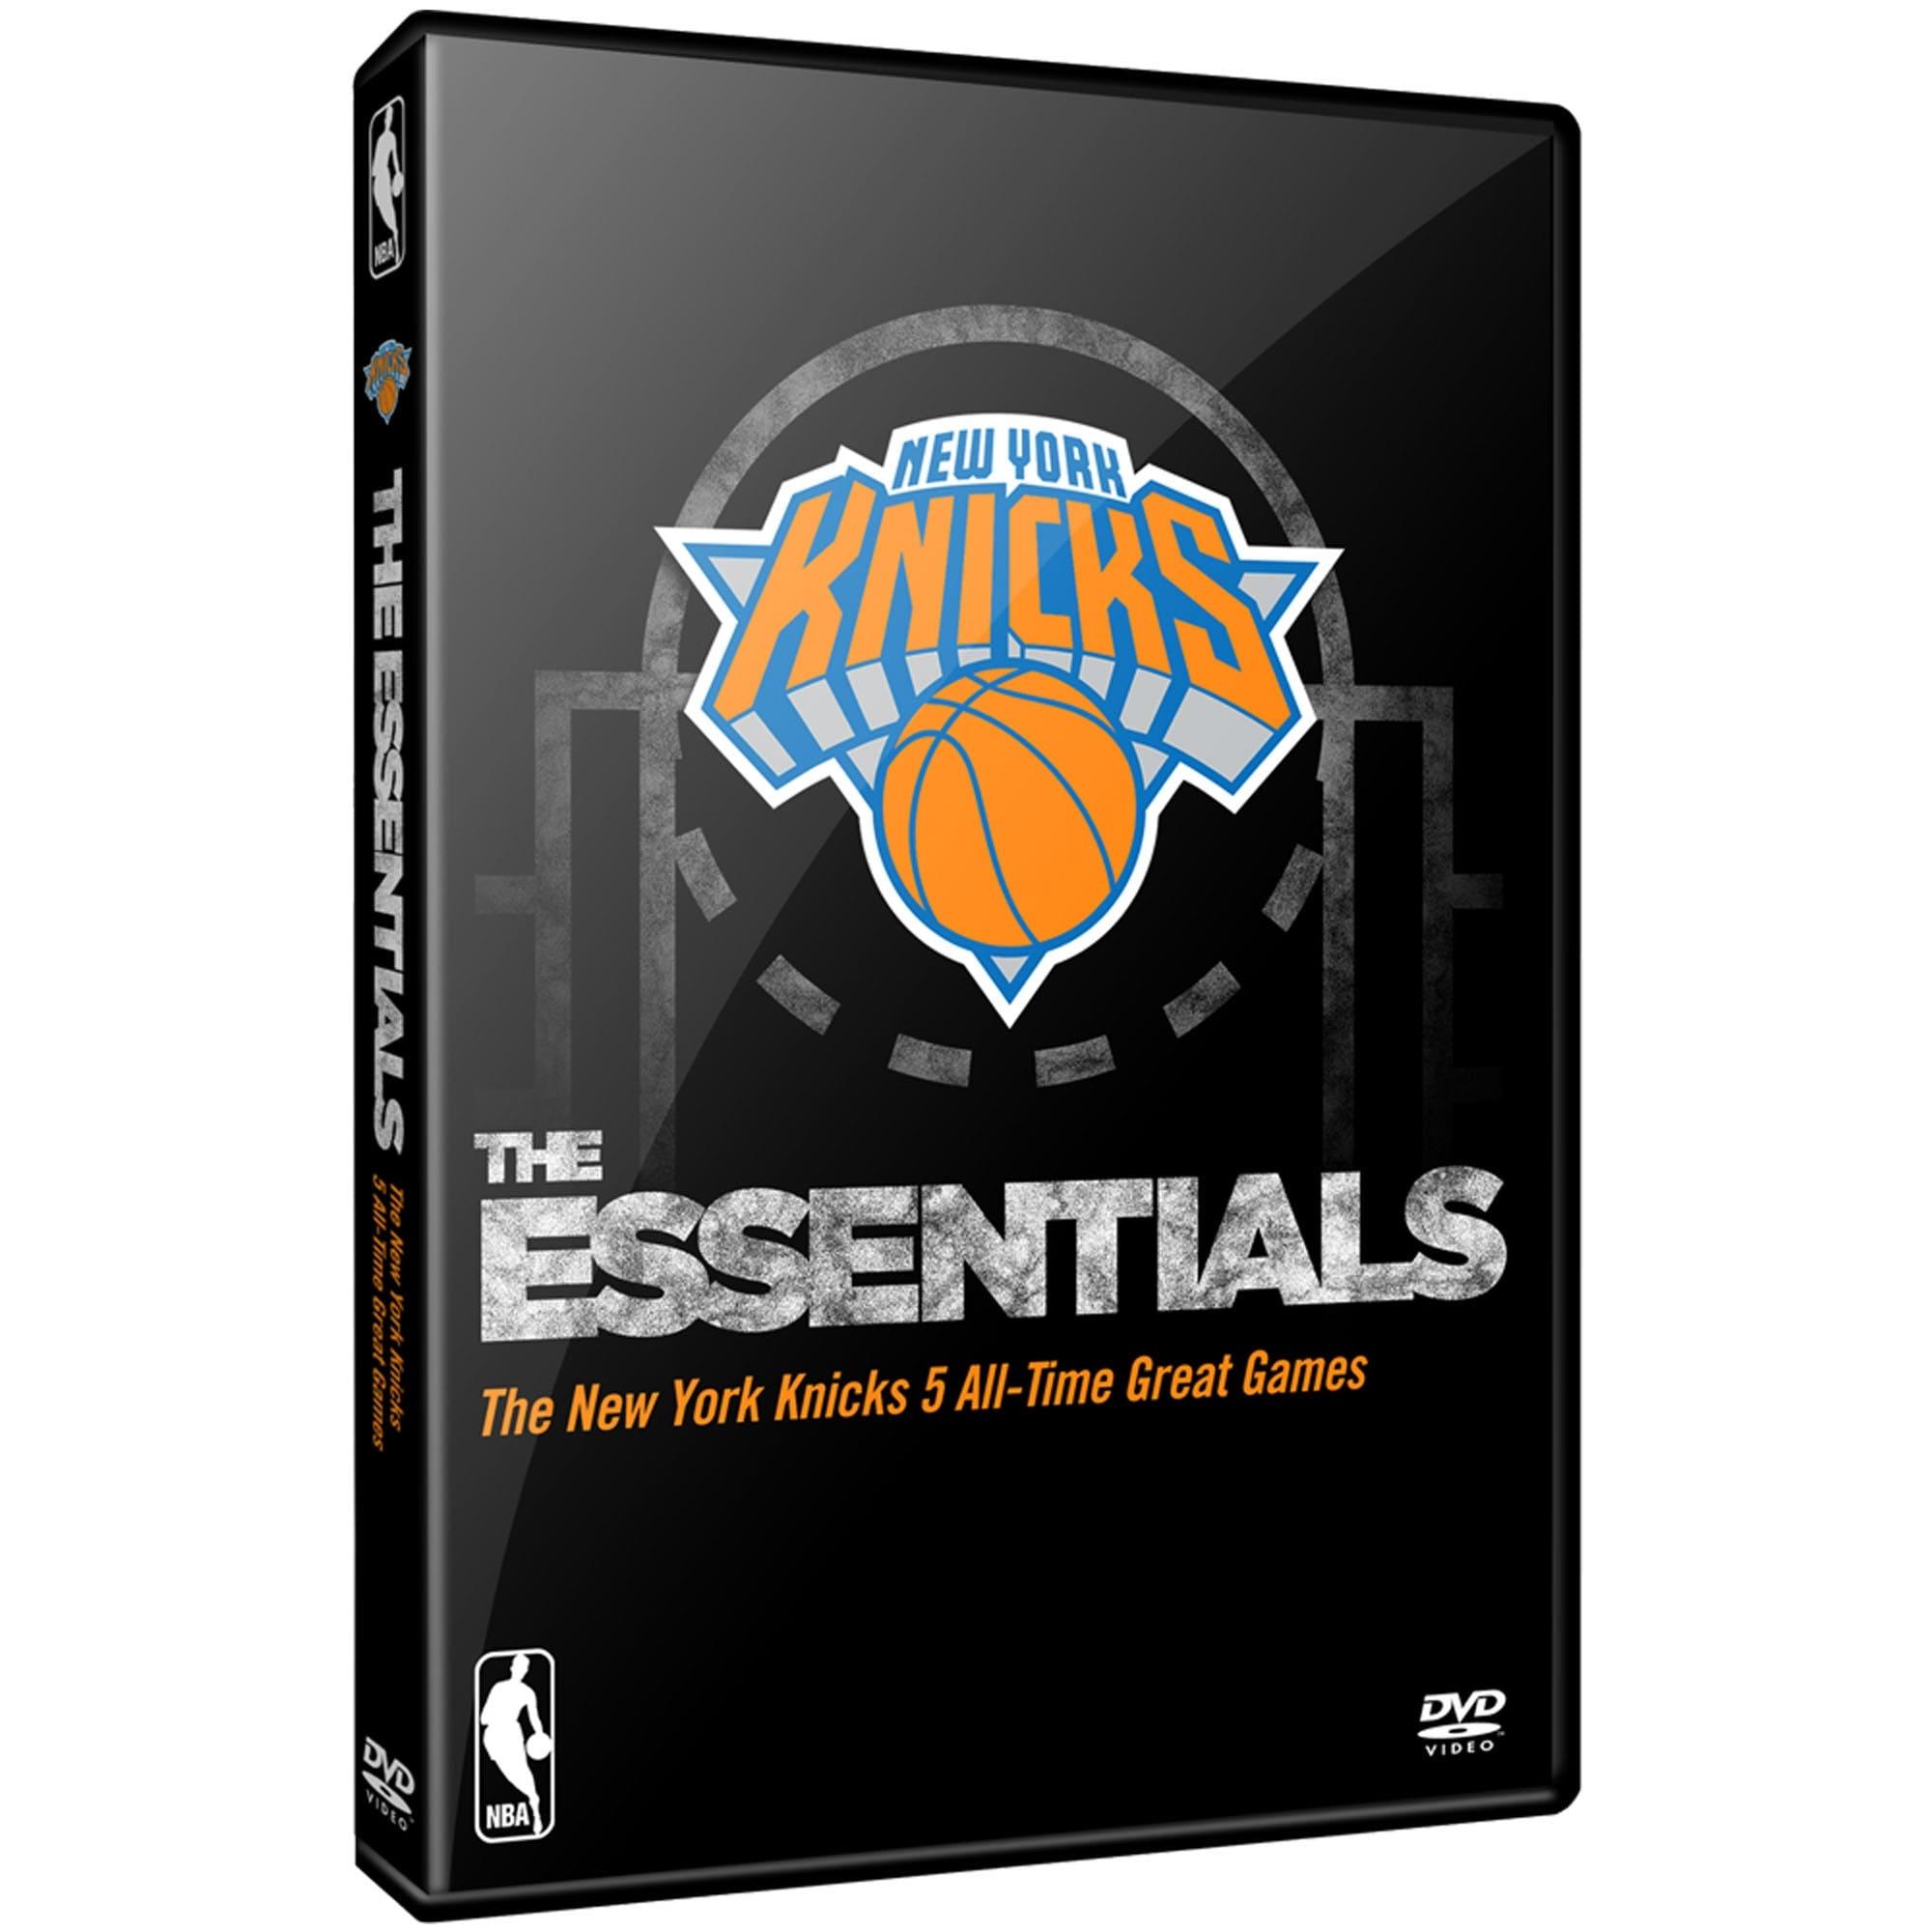 New York Knicks NBA Essentials DVD